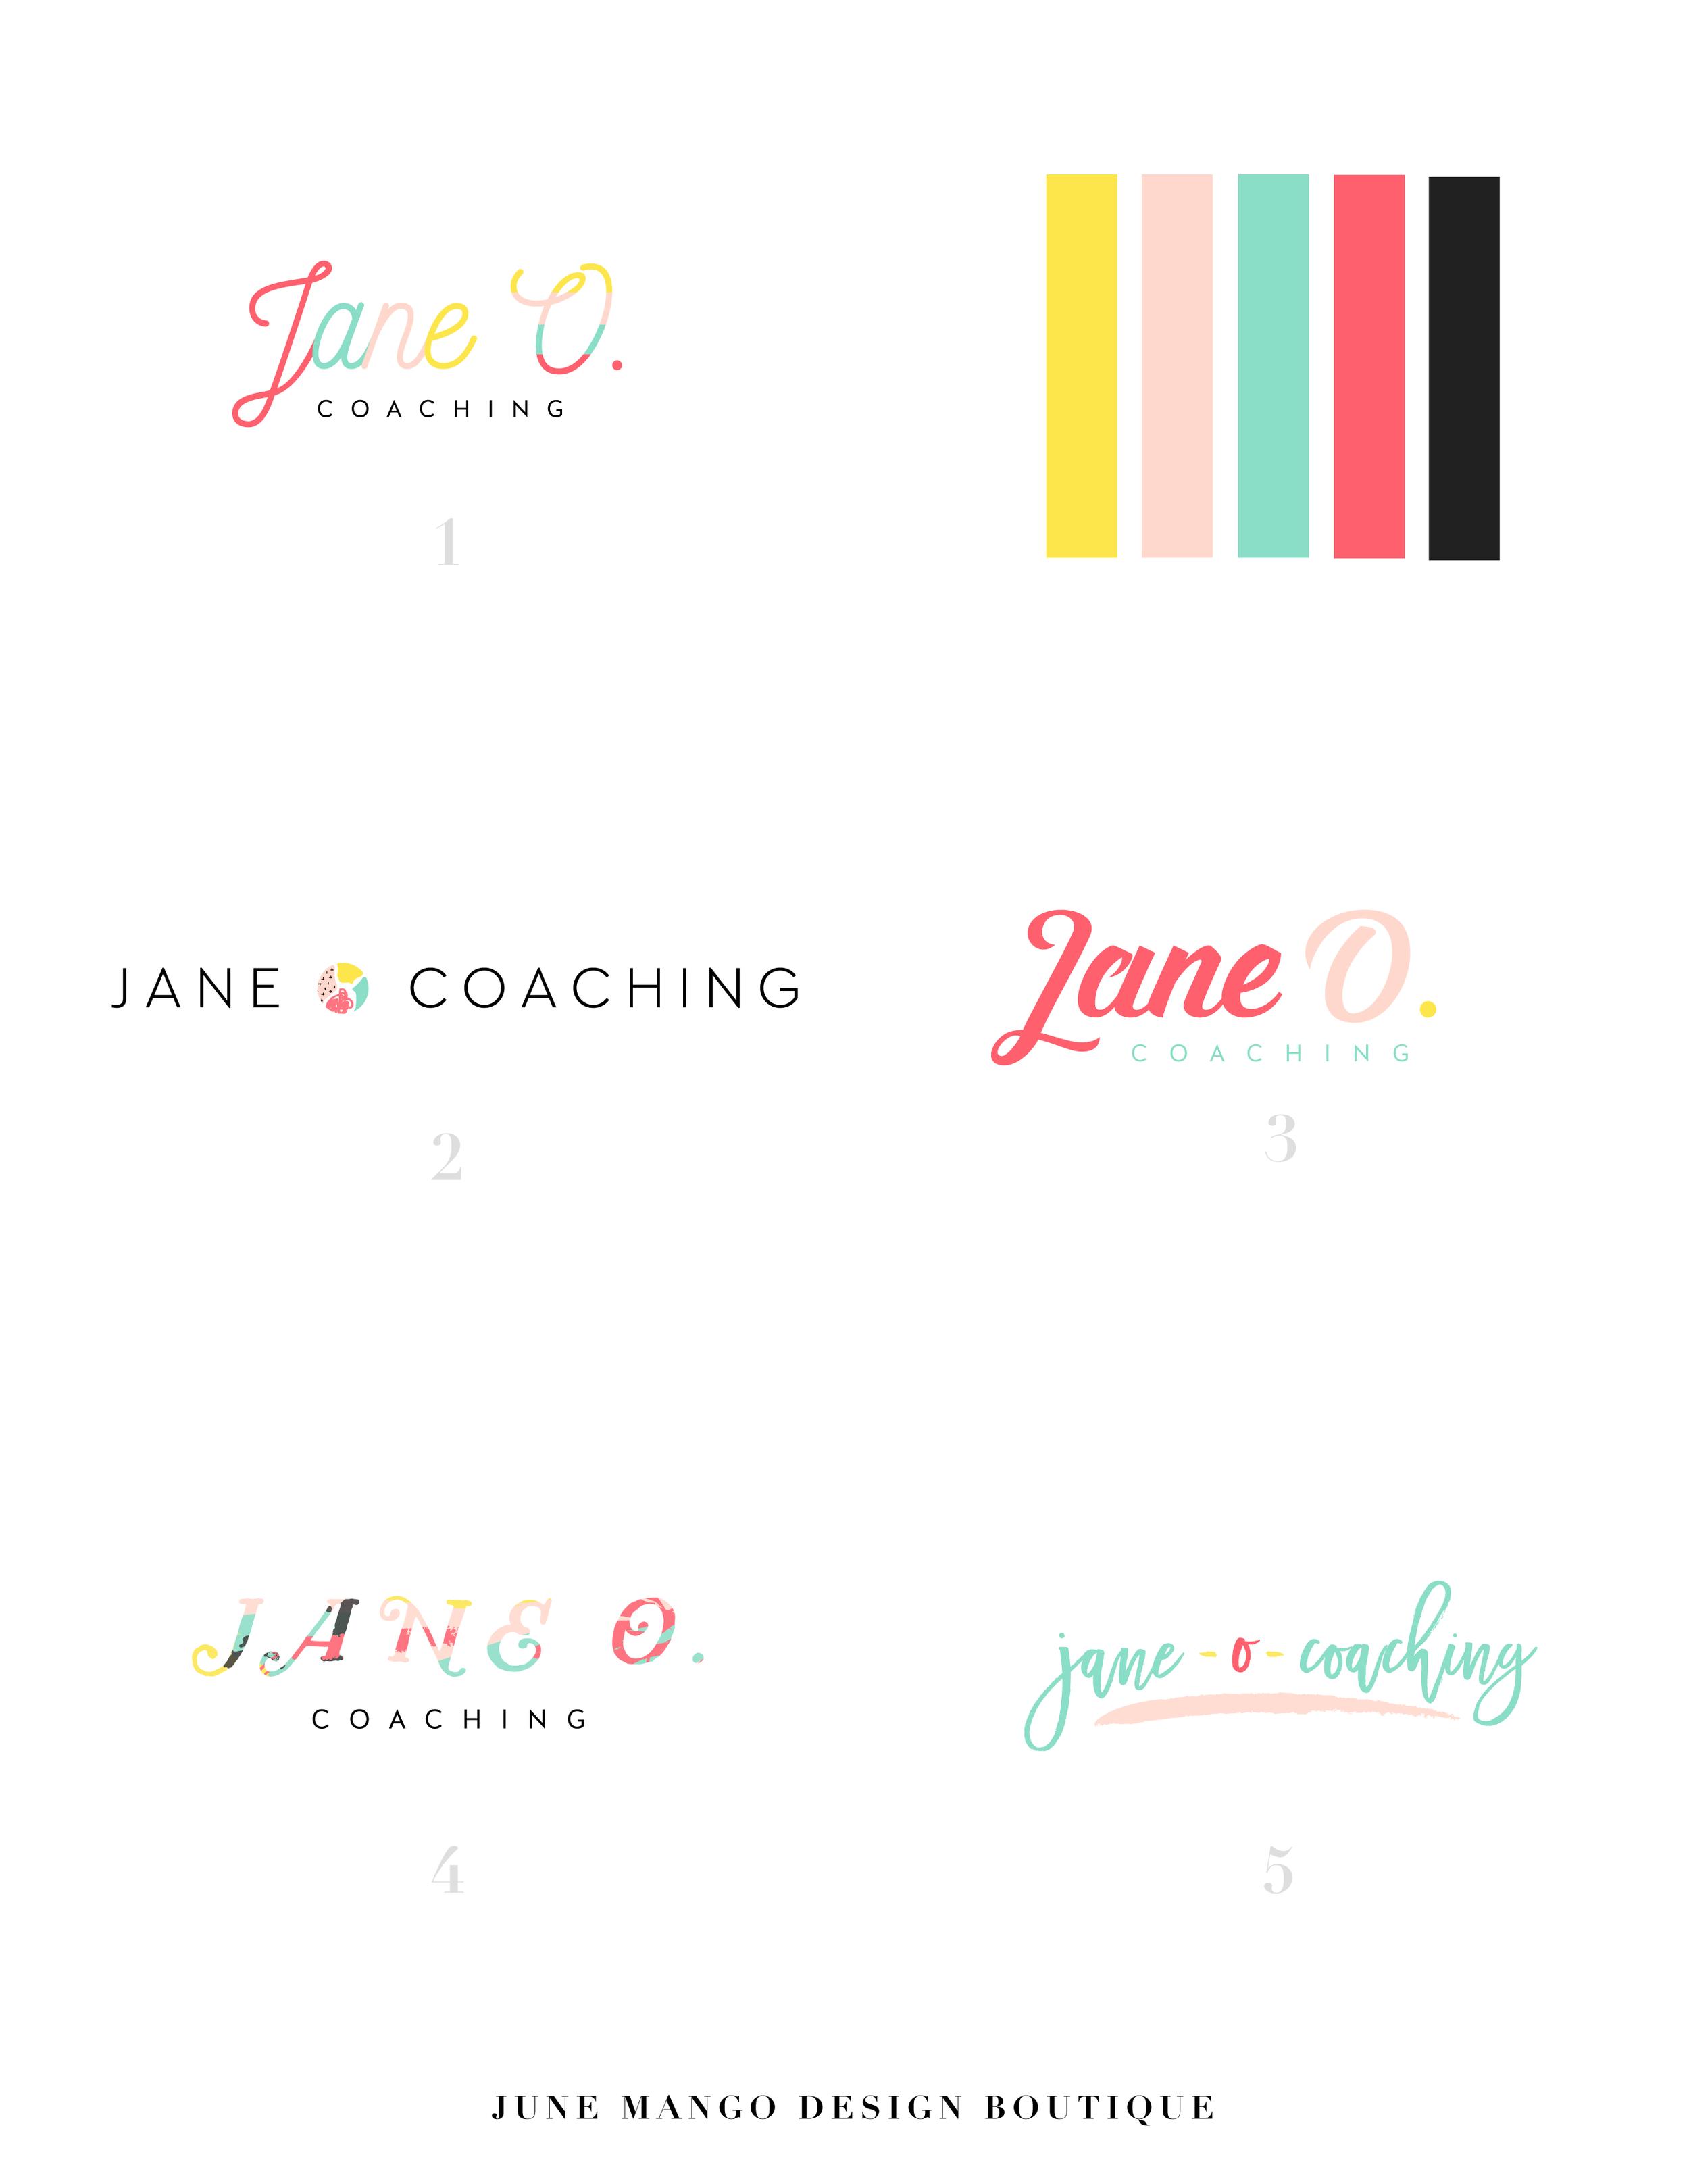 Jane-O.-Coaching-Logo-Process-01.png